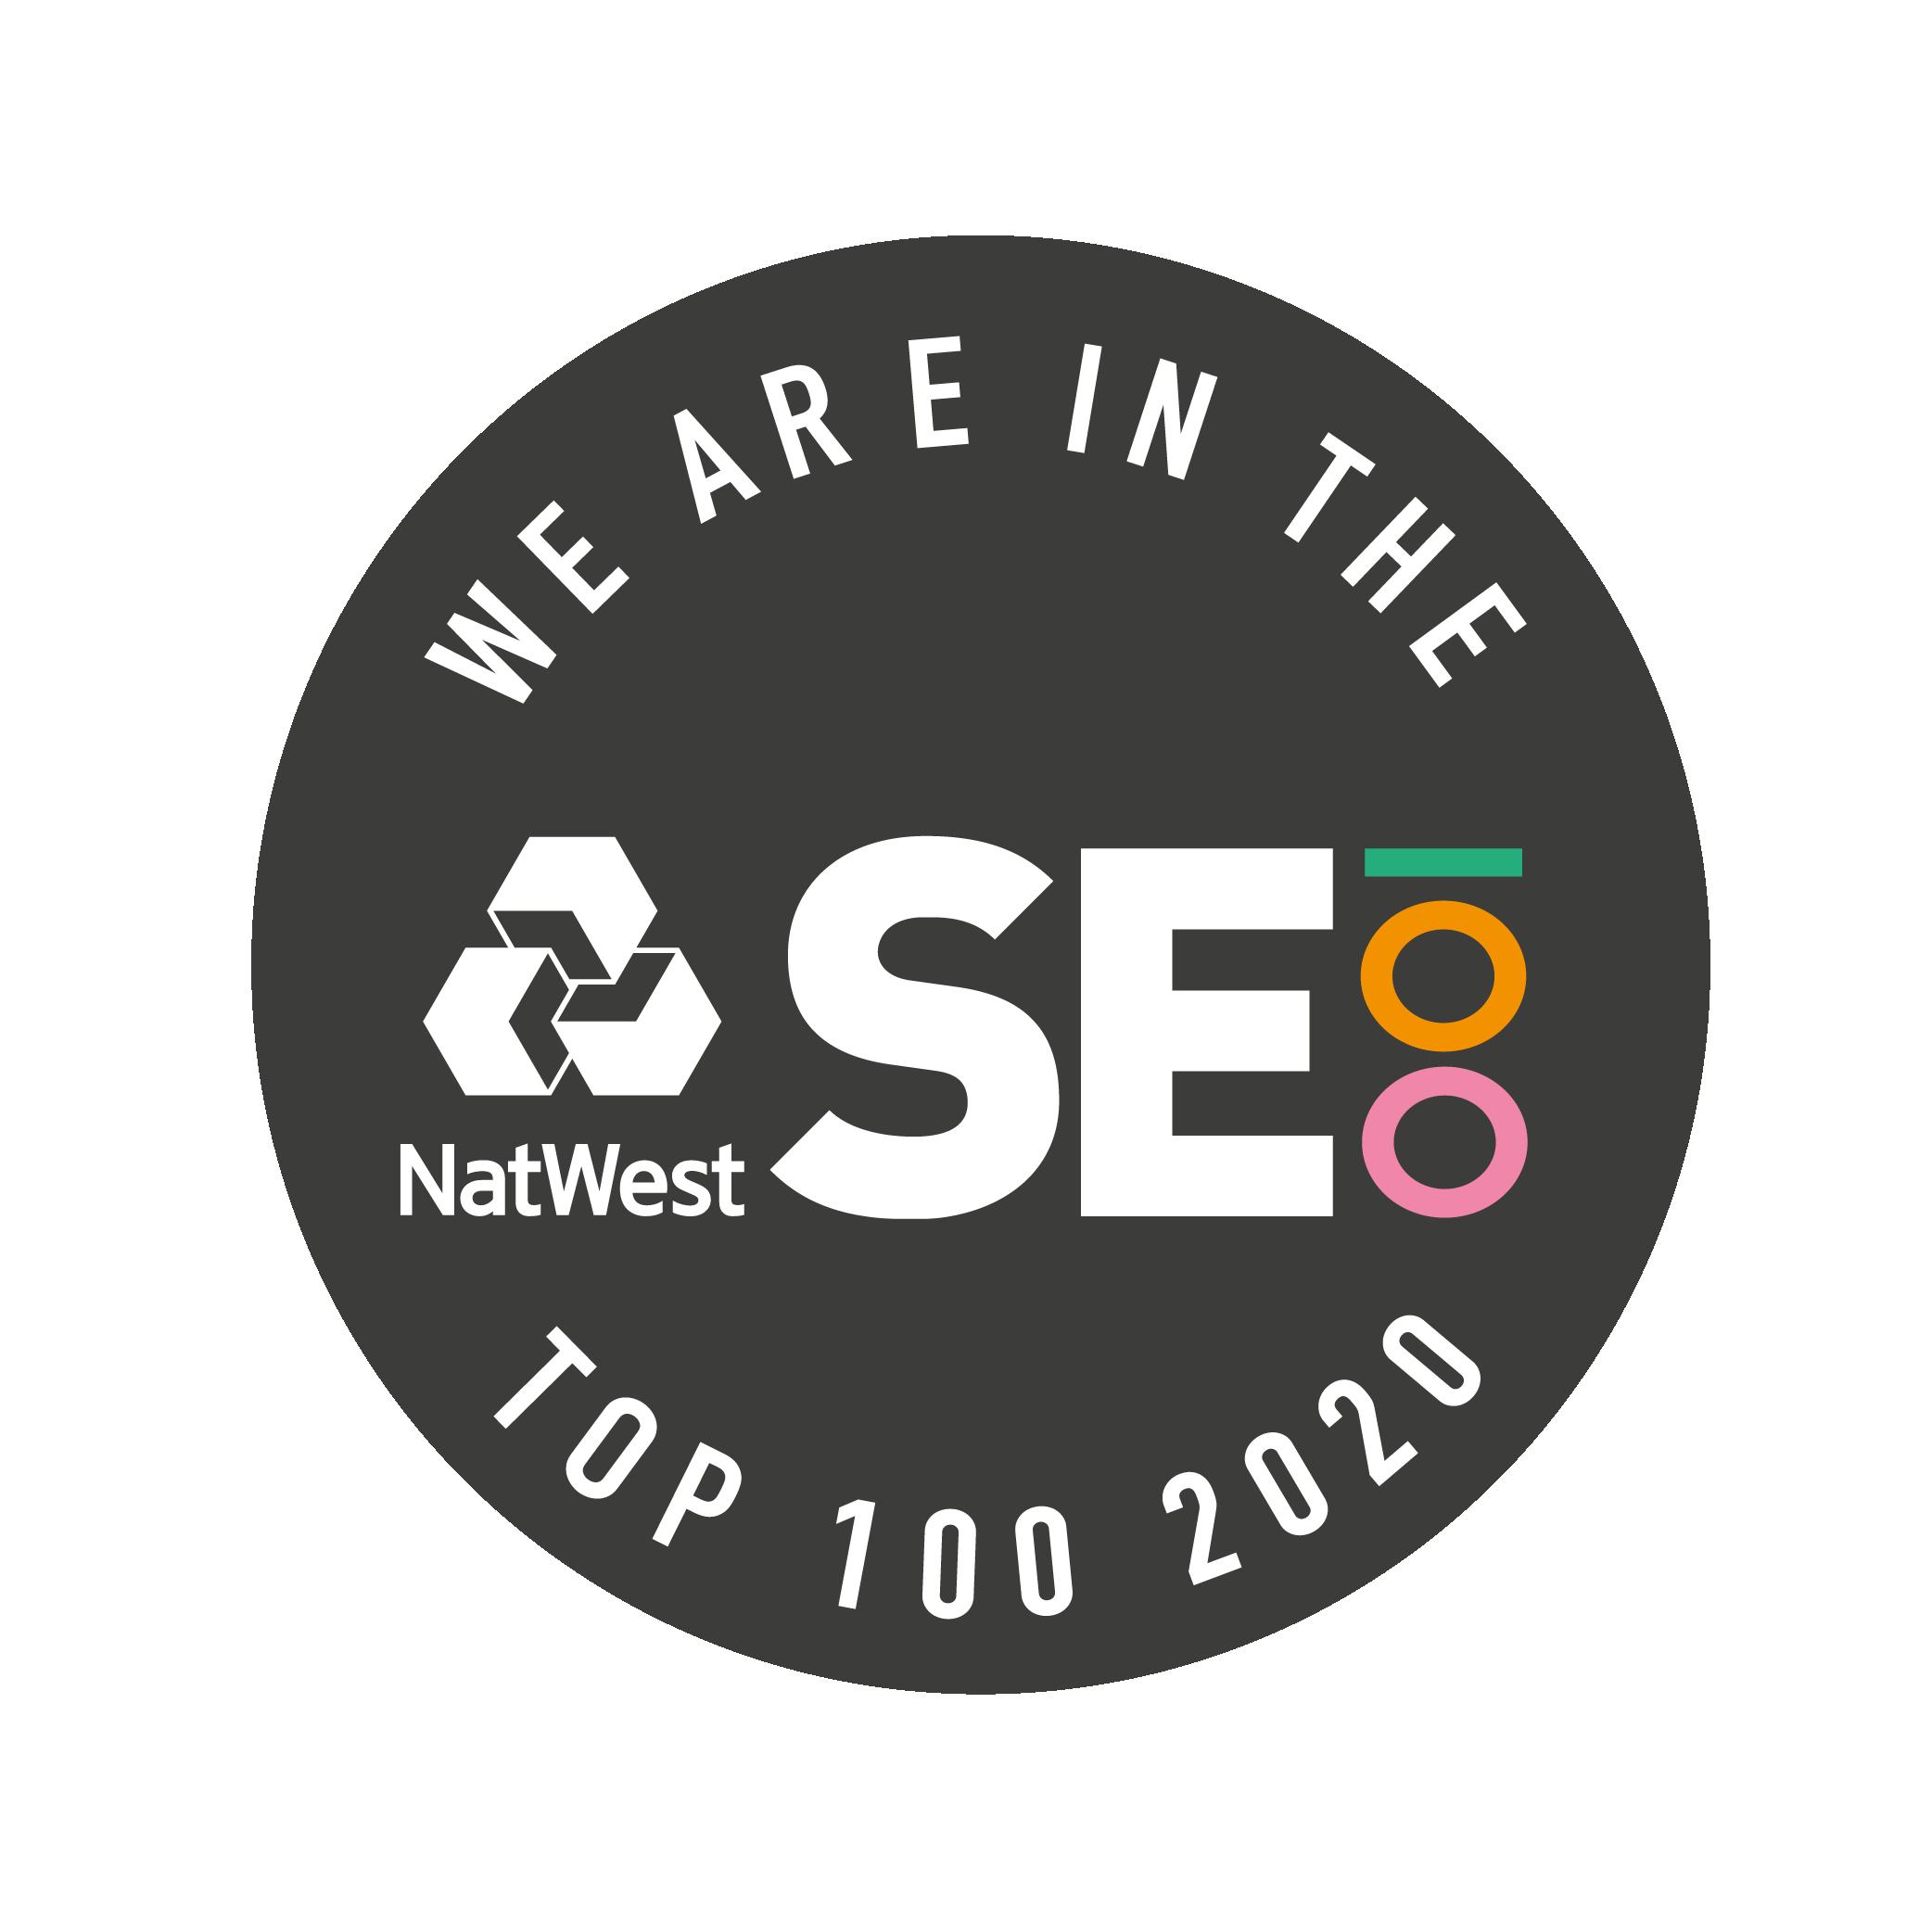 We are amongst the top 100 social enterprises